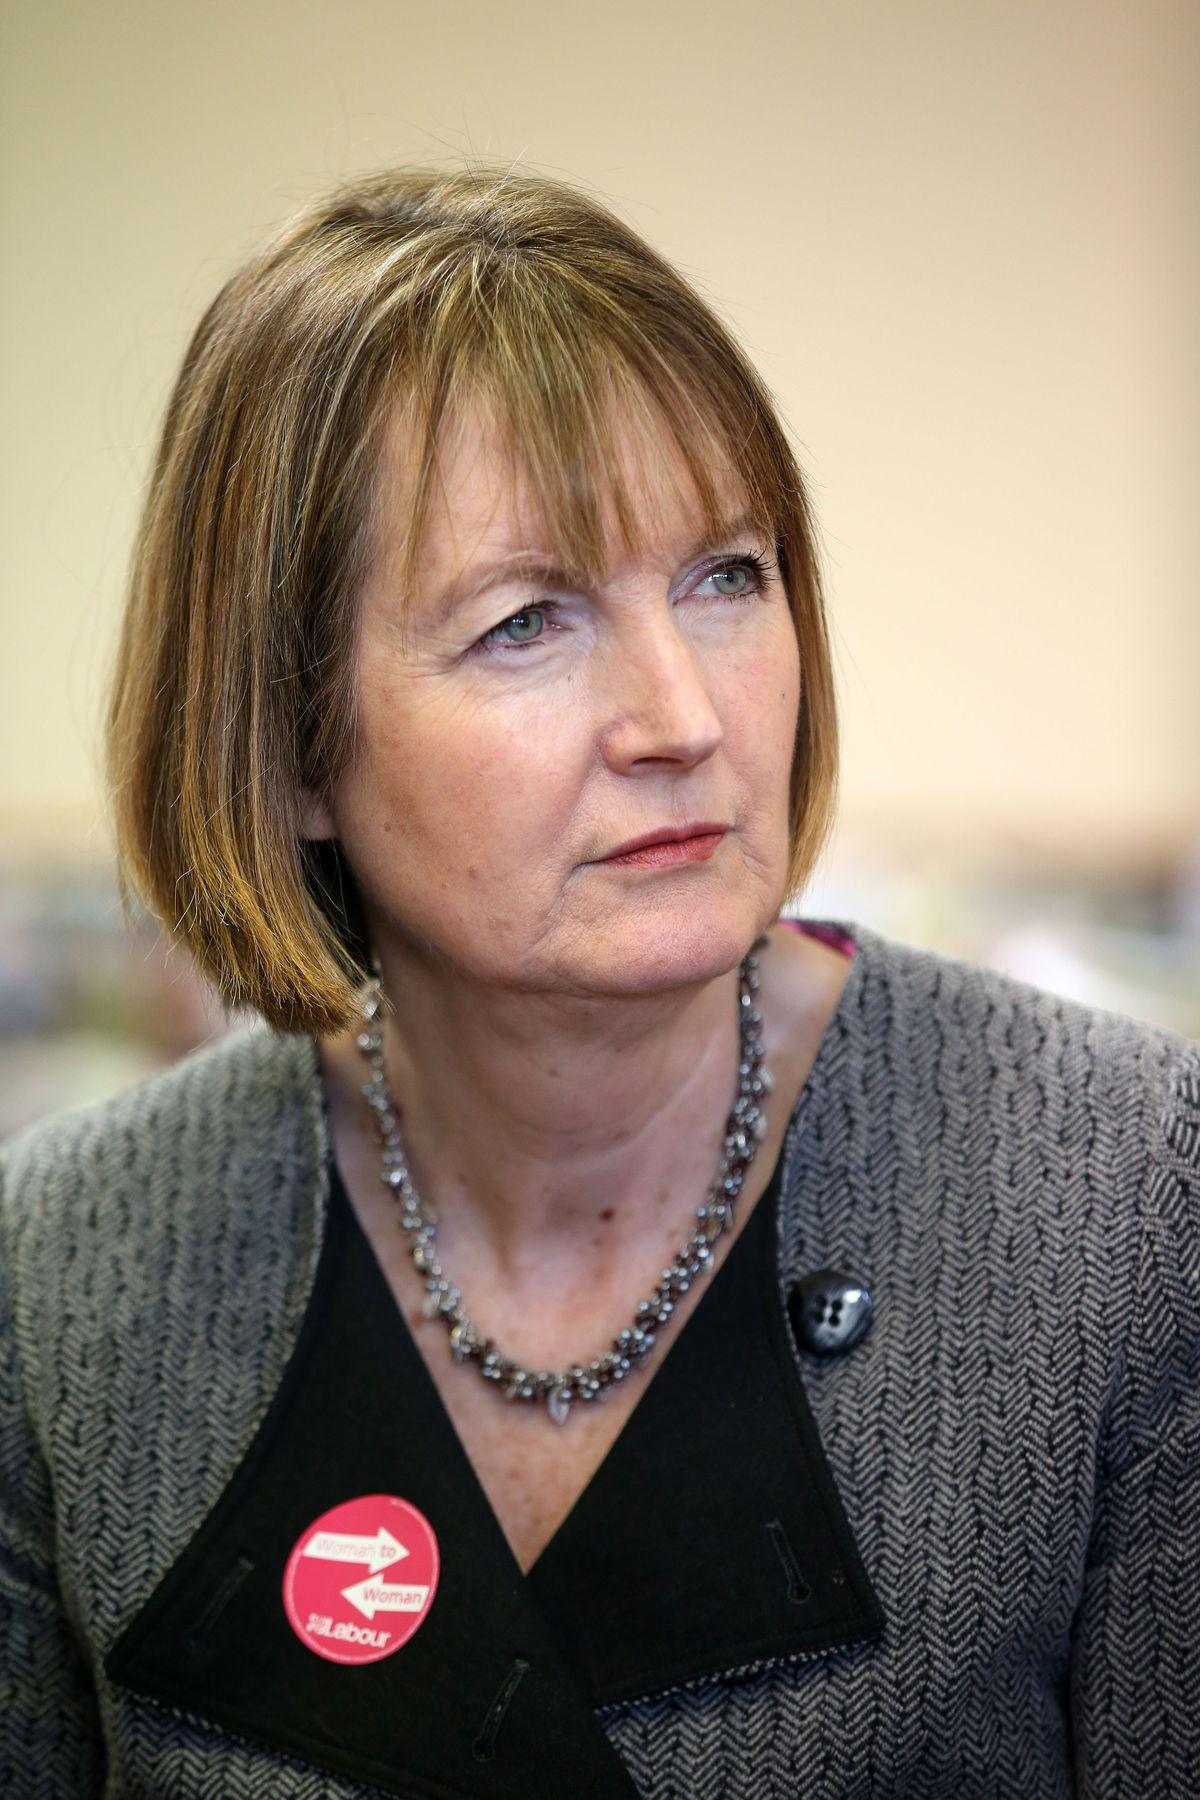 Harriet Harman has led the push for change